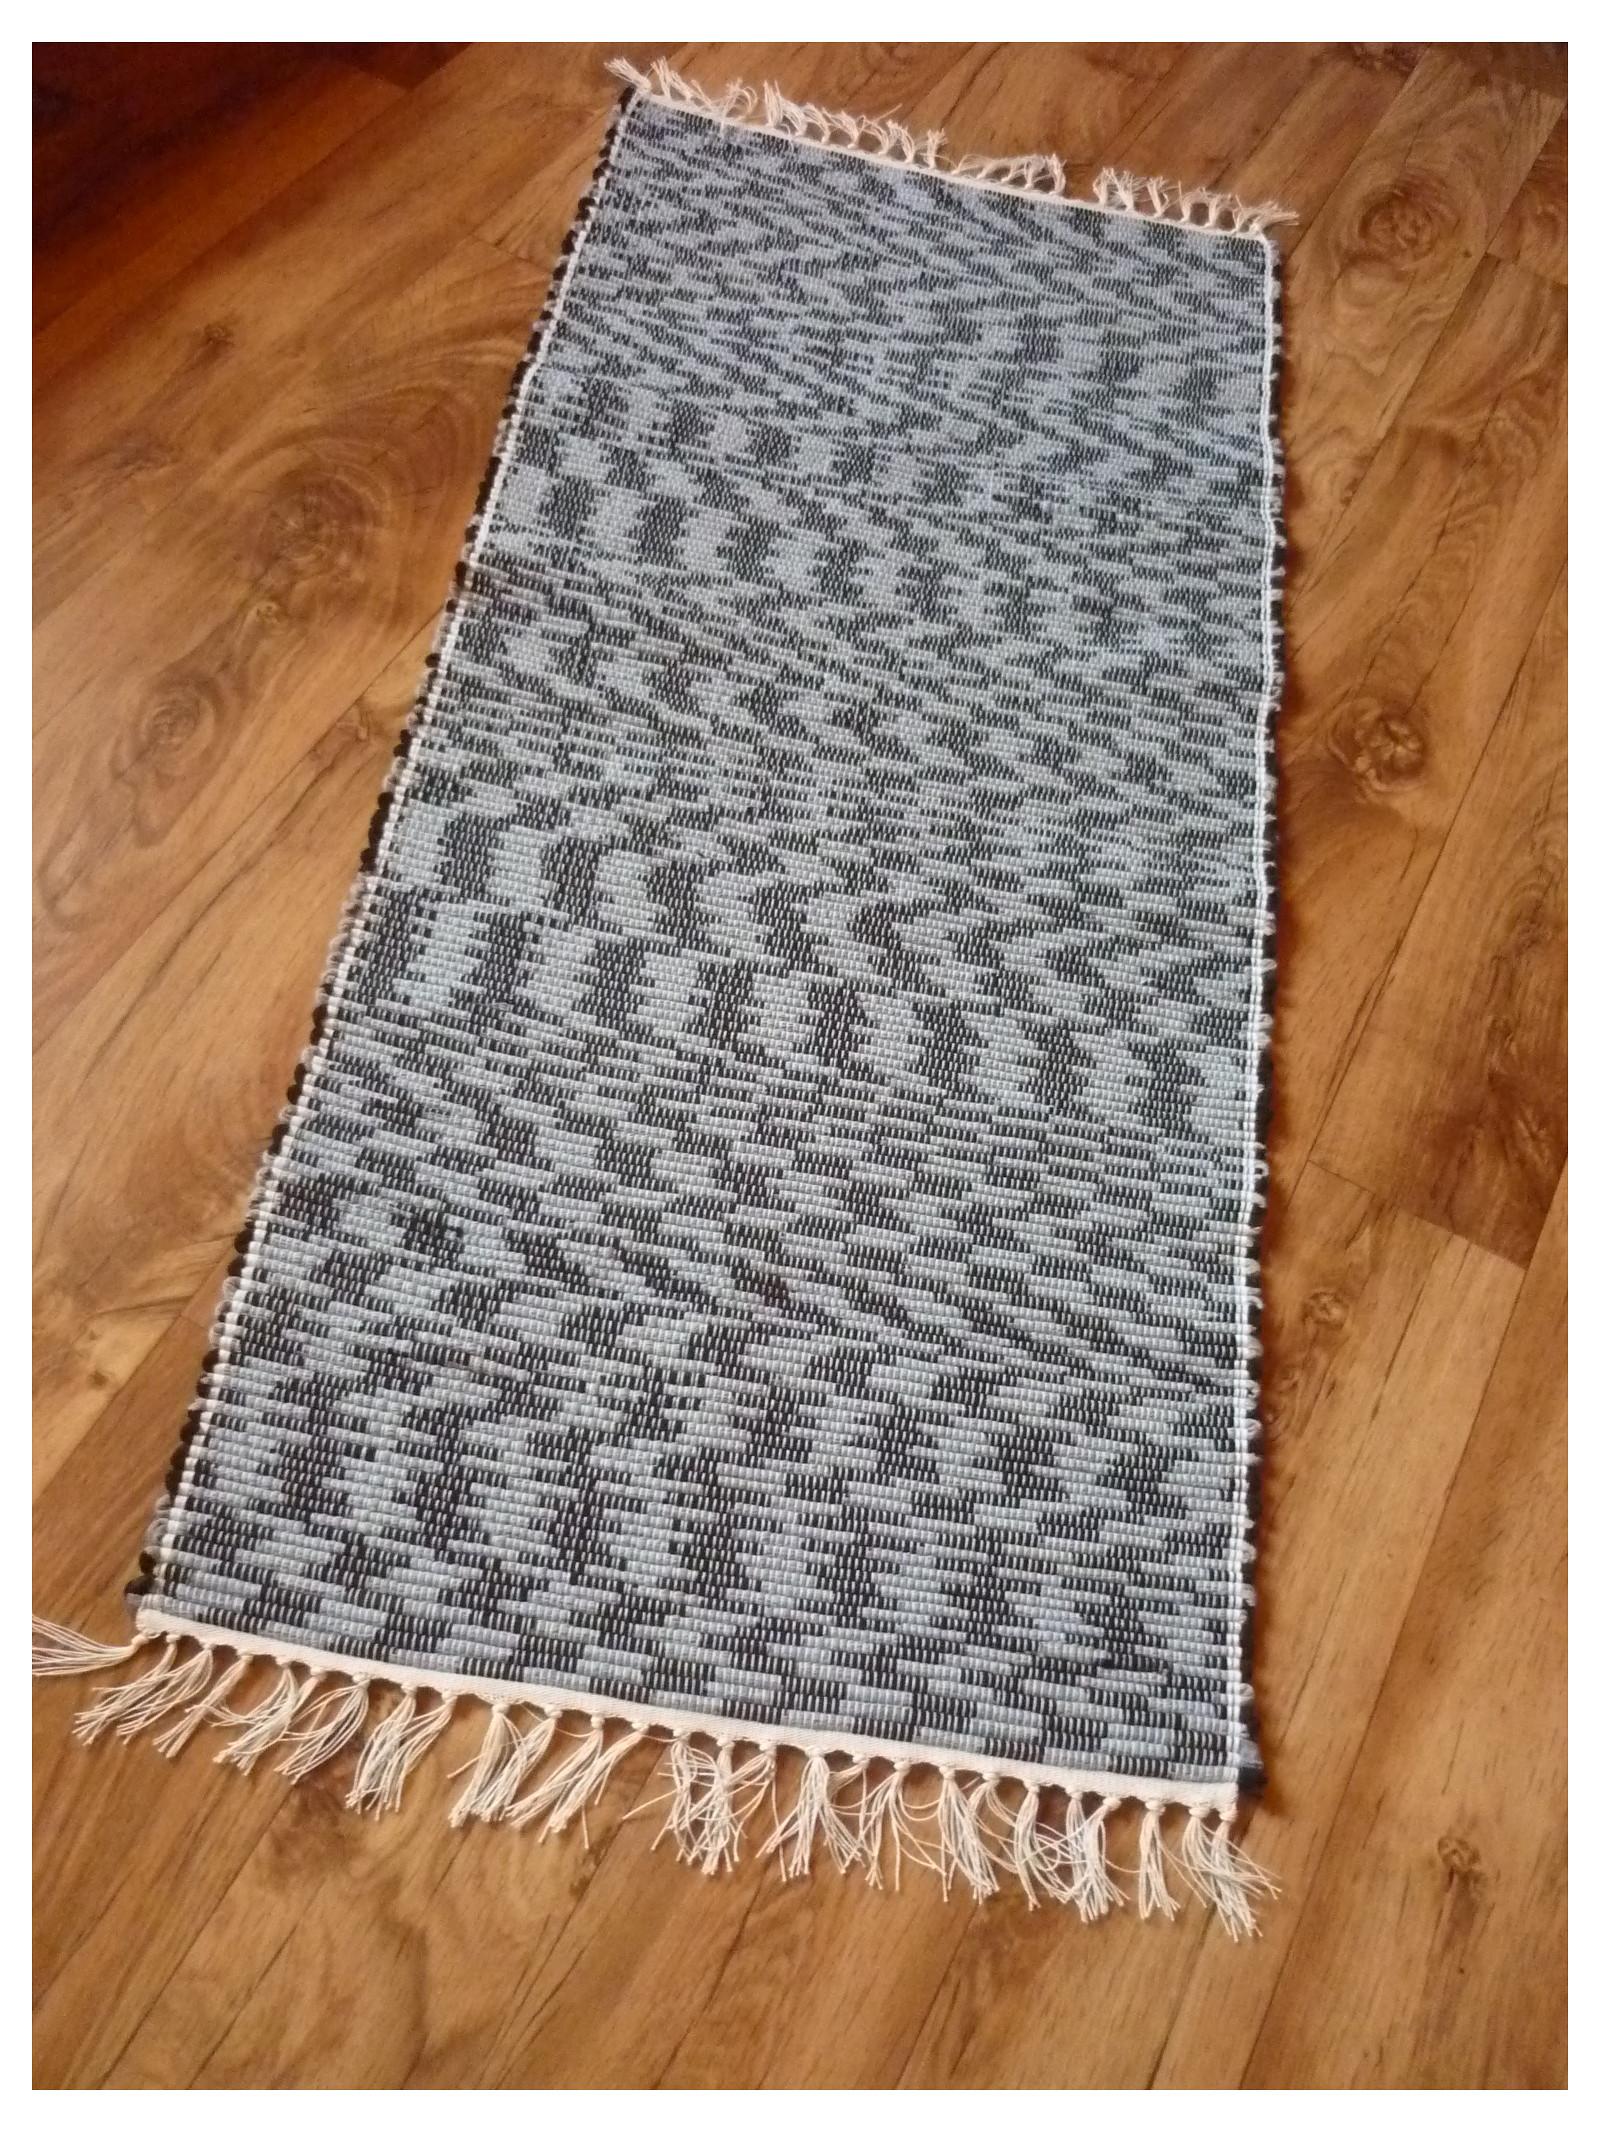 Ručně tkaný koberec -50 x 120 cm - Tkané koberce Halenkov d8c2187d53